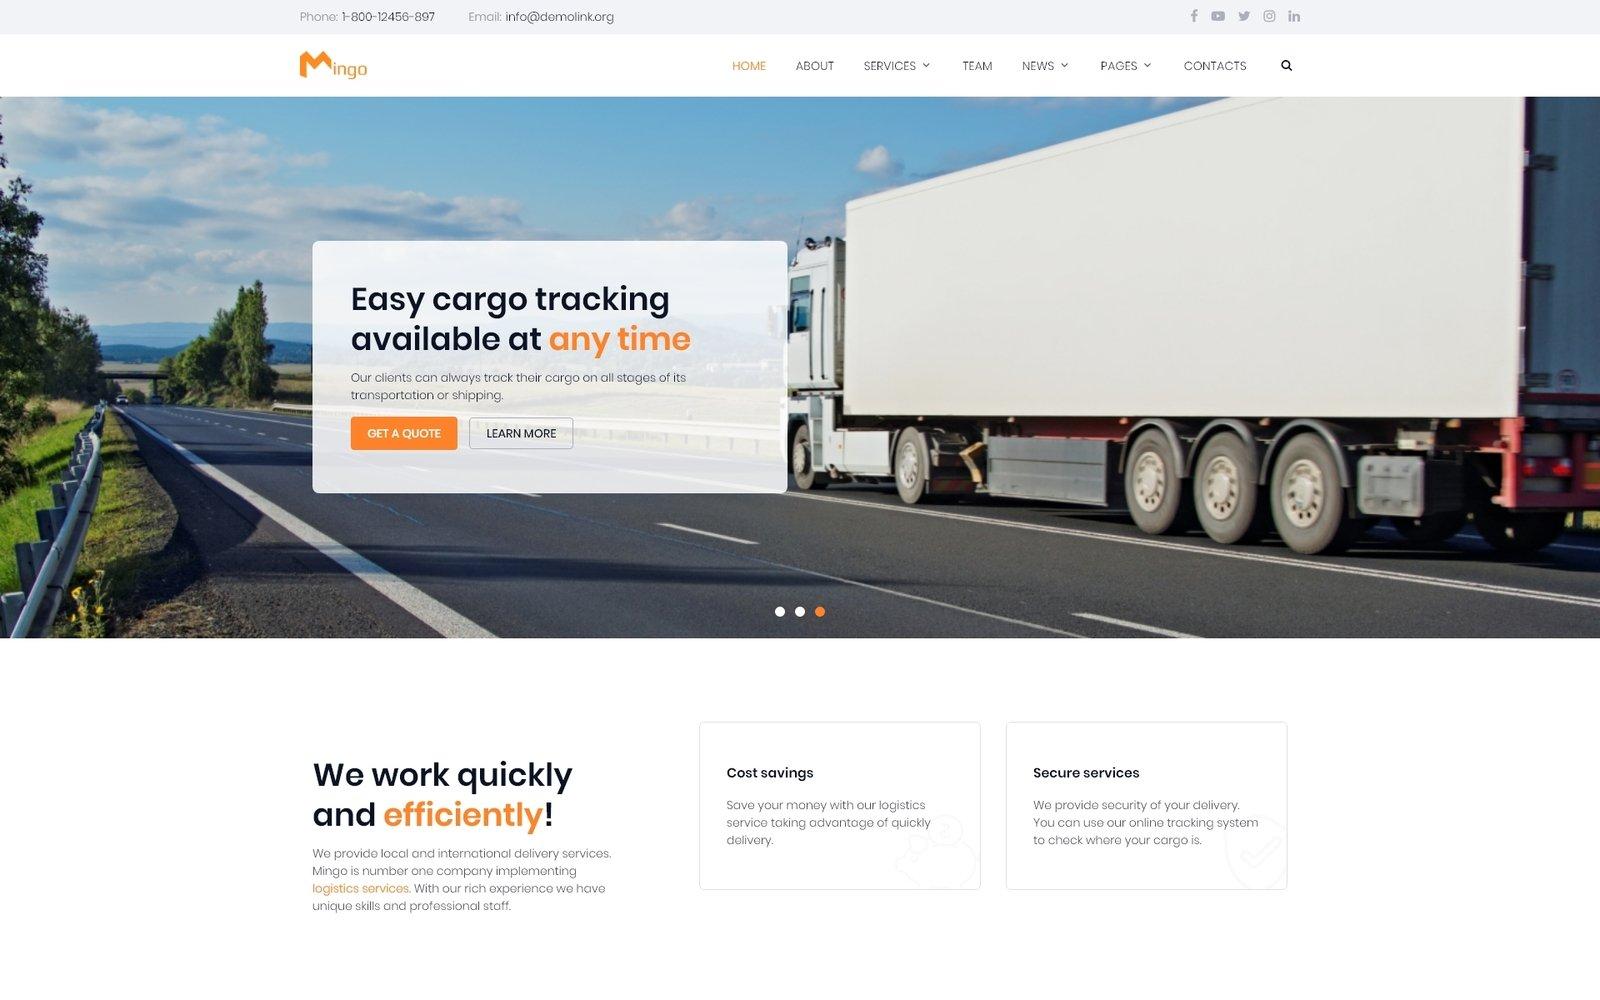 """Mingo - Delivery Services Multipage Clean HTML"" modèle web adaptatif #80995 - screenshot"